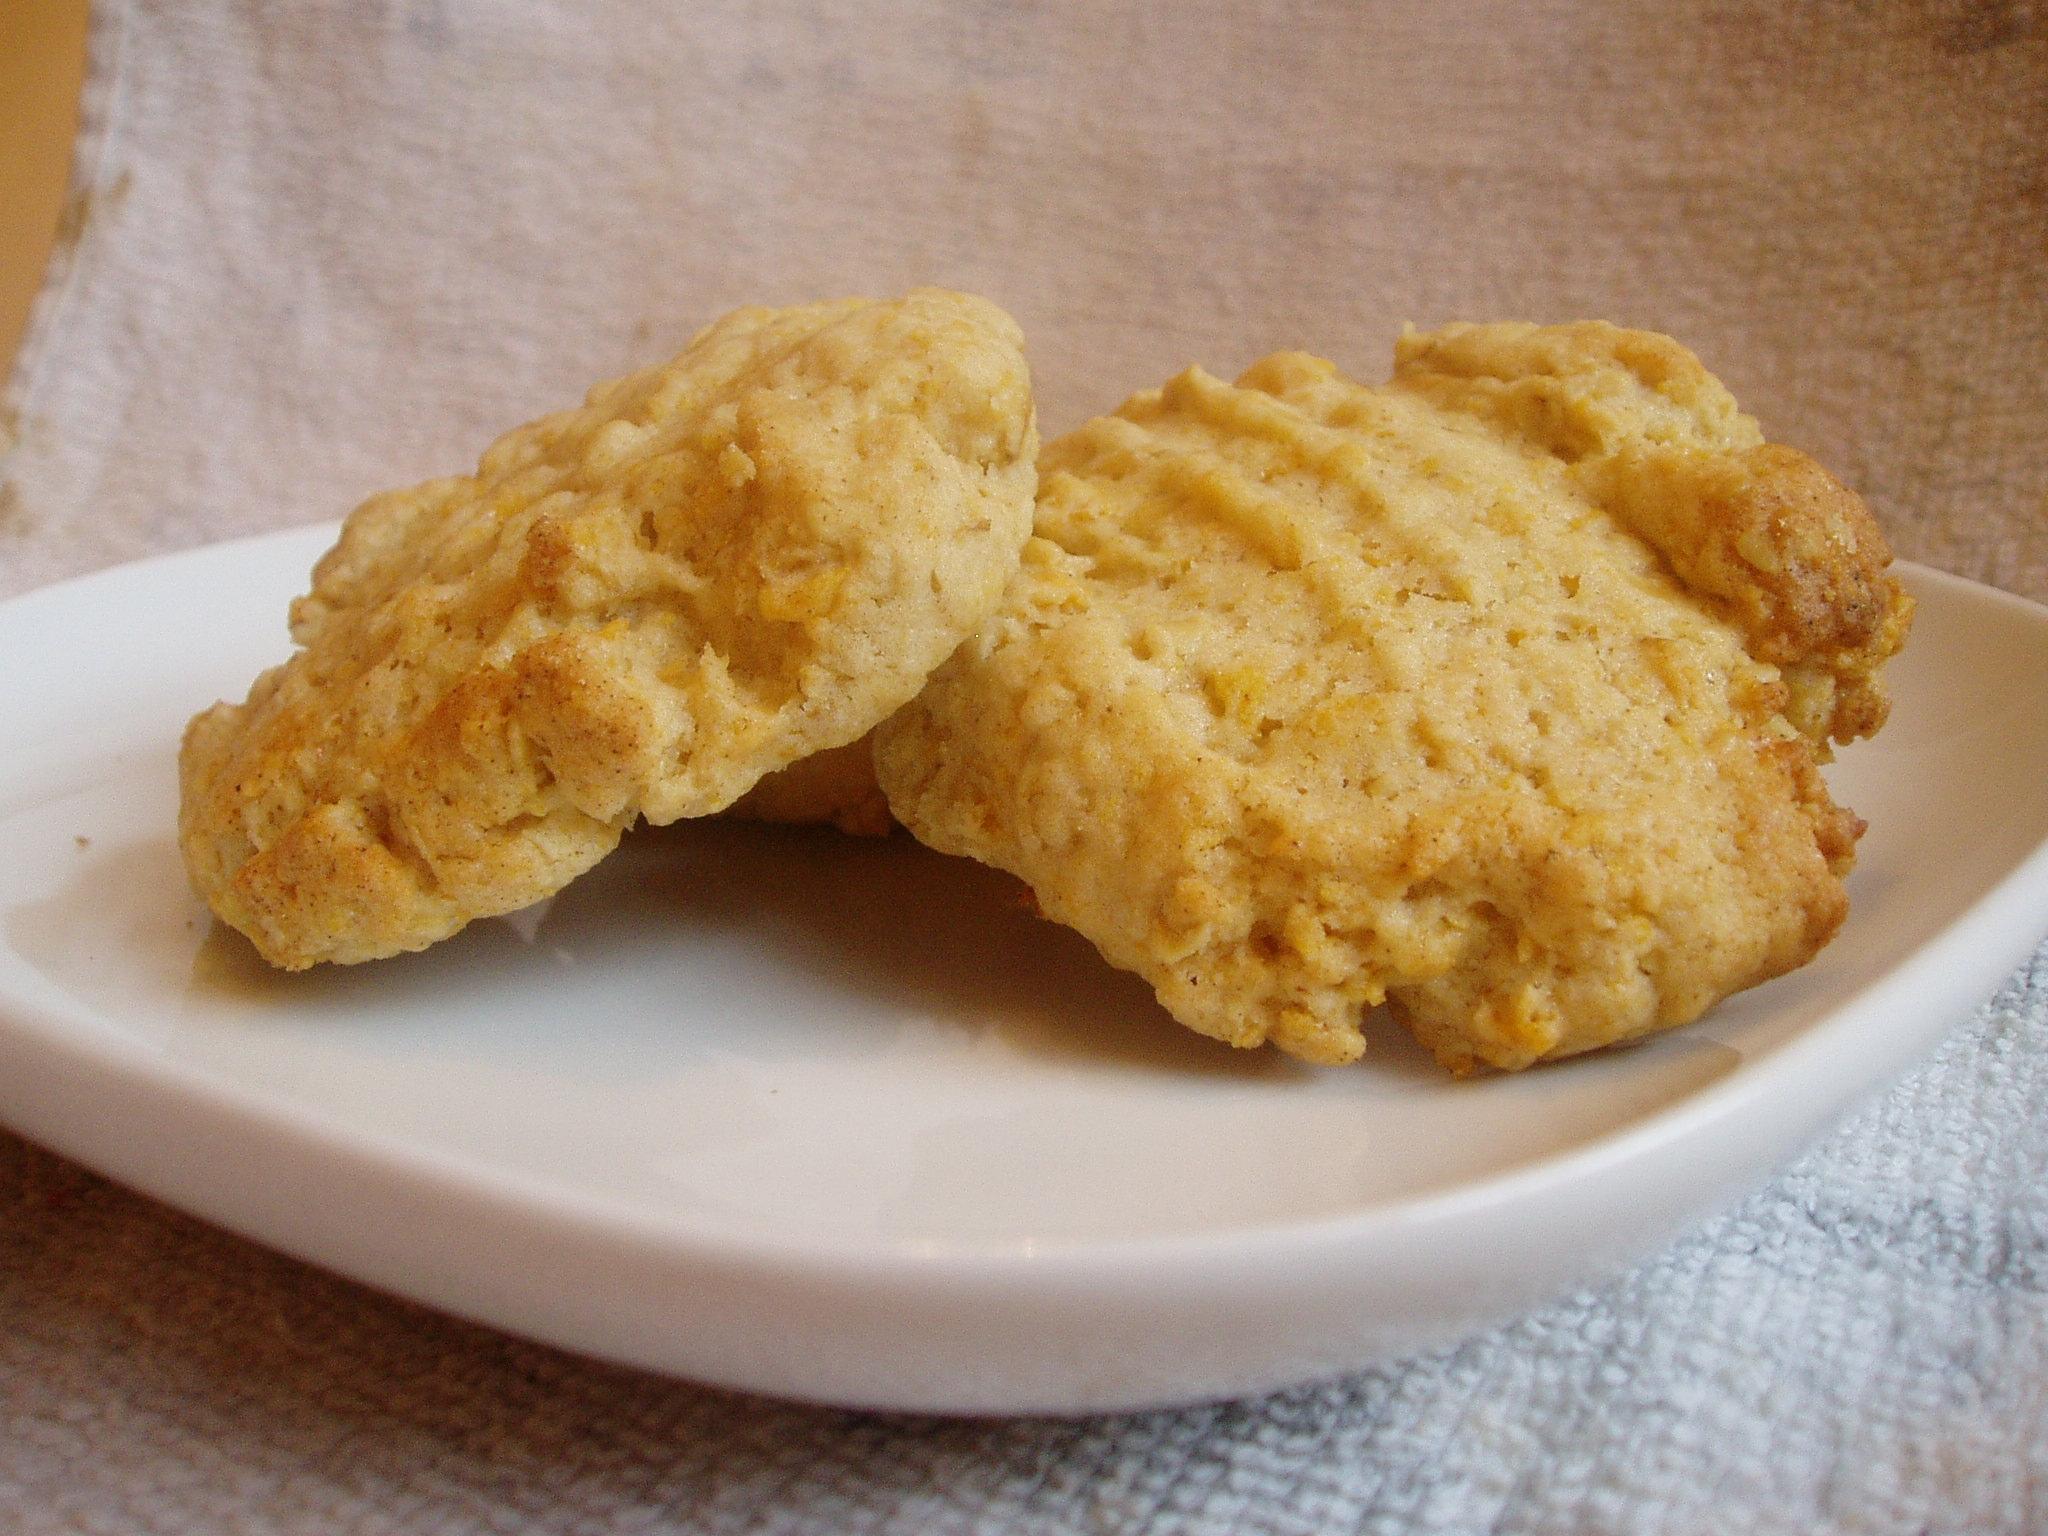 World's Best Cookies Aka That 70s Elusive Cornflake Cookies